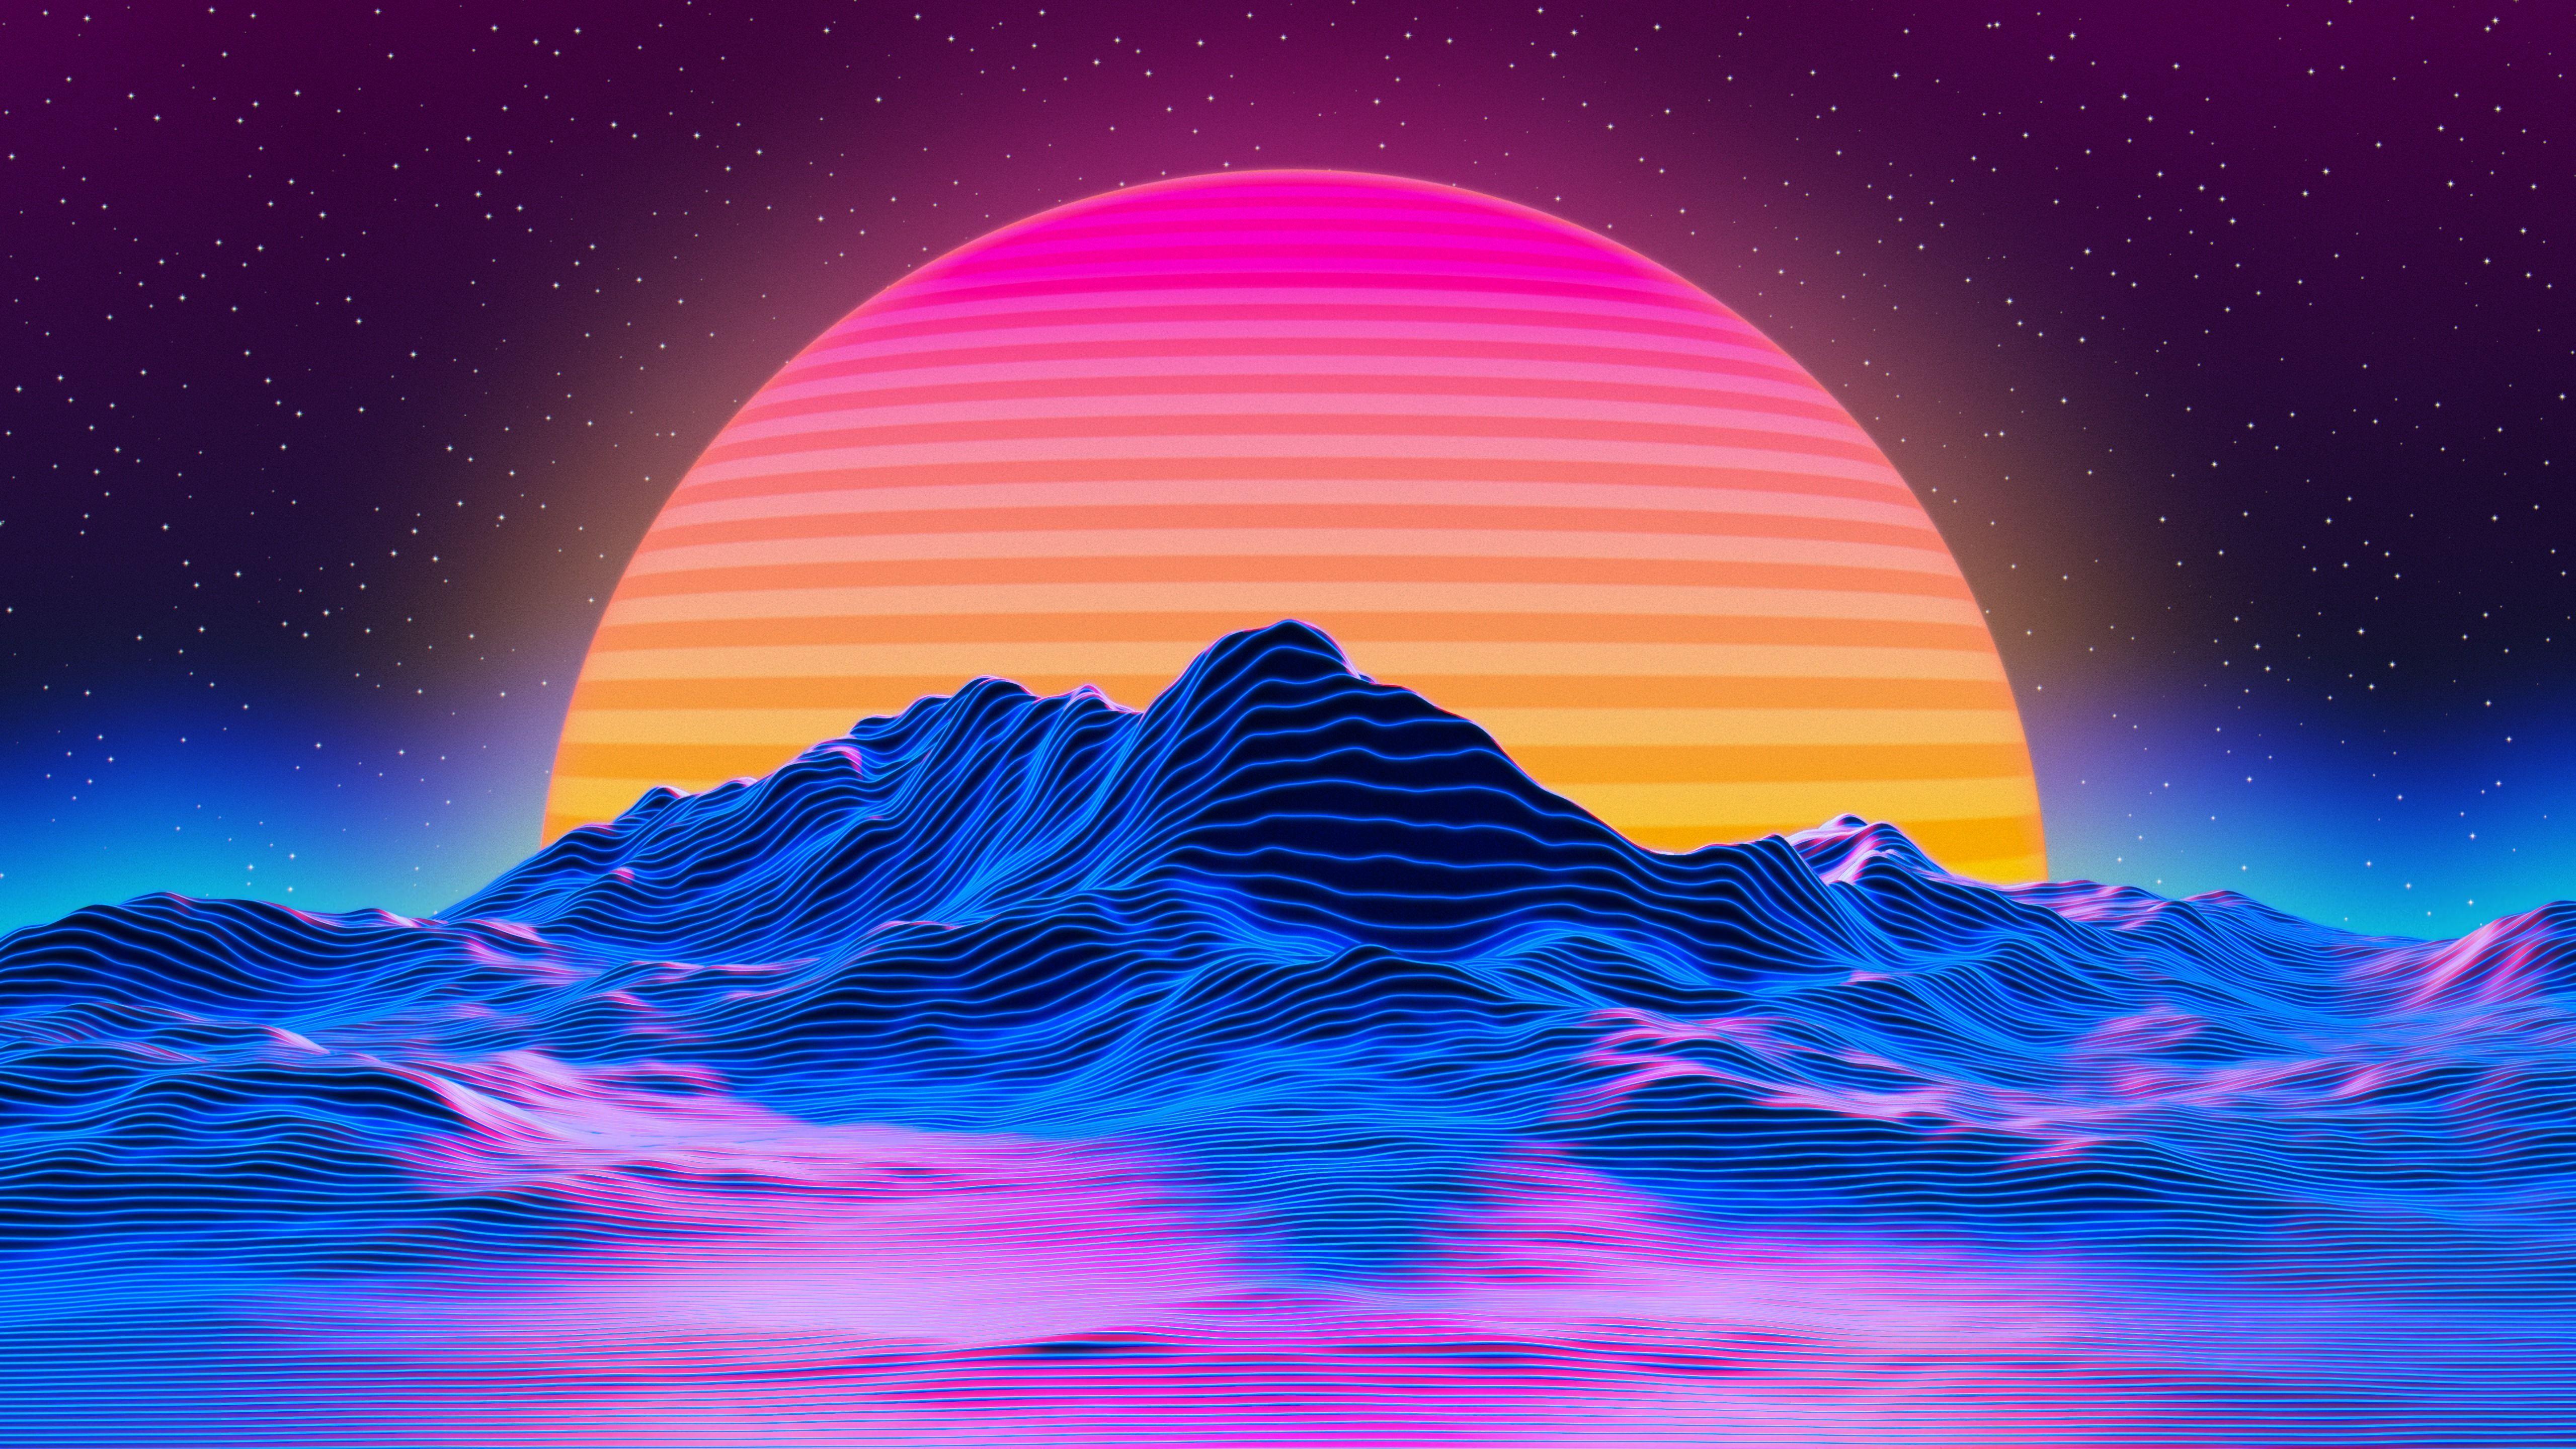 Sun Mountain Neon Sunlight Landscape In 2020 Desktop Wallpaper Art Aesthetic Desktop Wallpaper Vaporwave Wallpaper